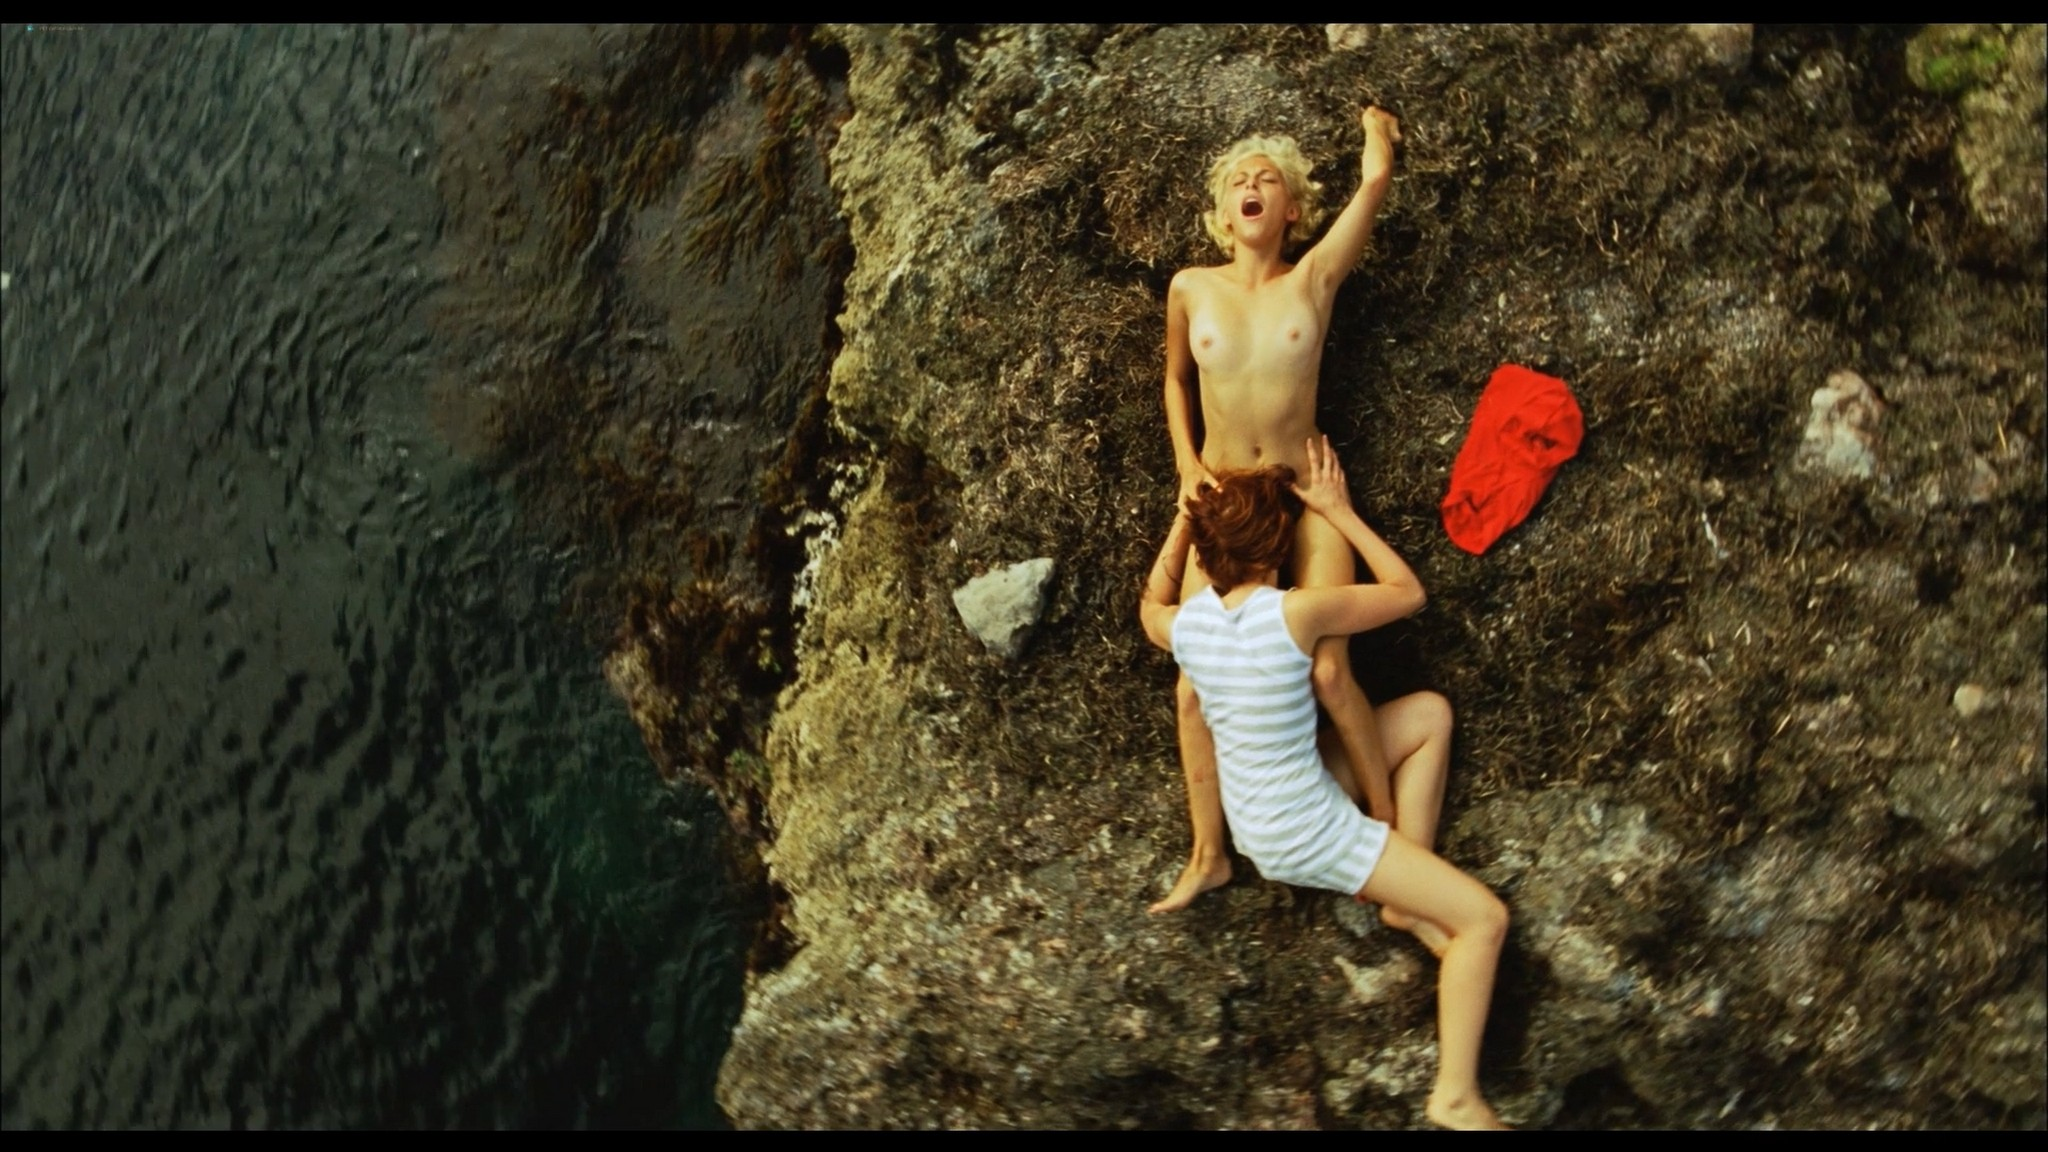 Avalon Barrie nude and Lyudmila Shiryaeva nude full frontal Sappho 2008 HD 1080p BluRay REMUX 11